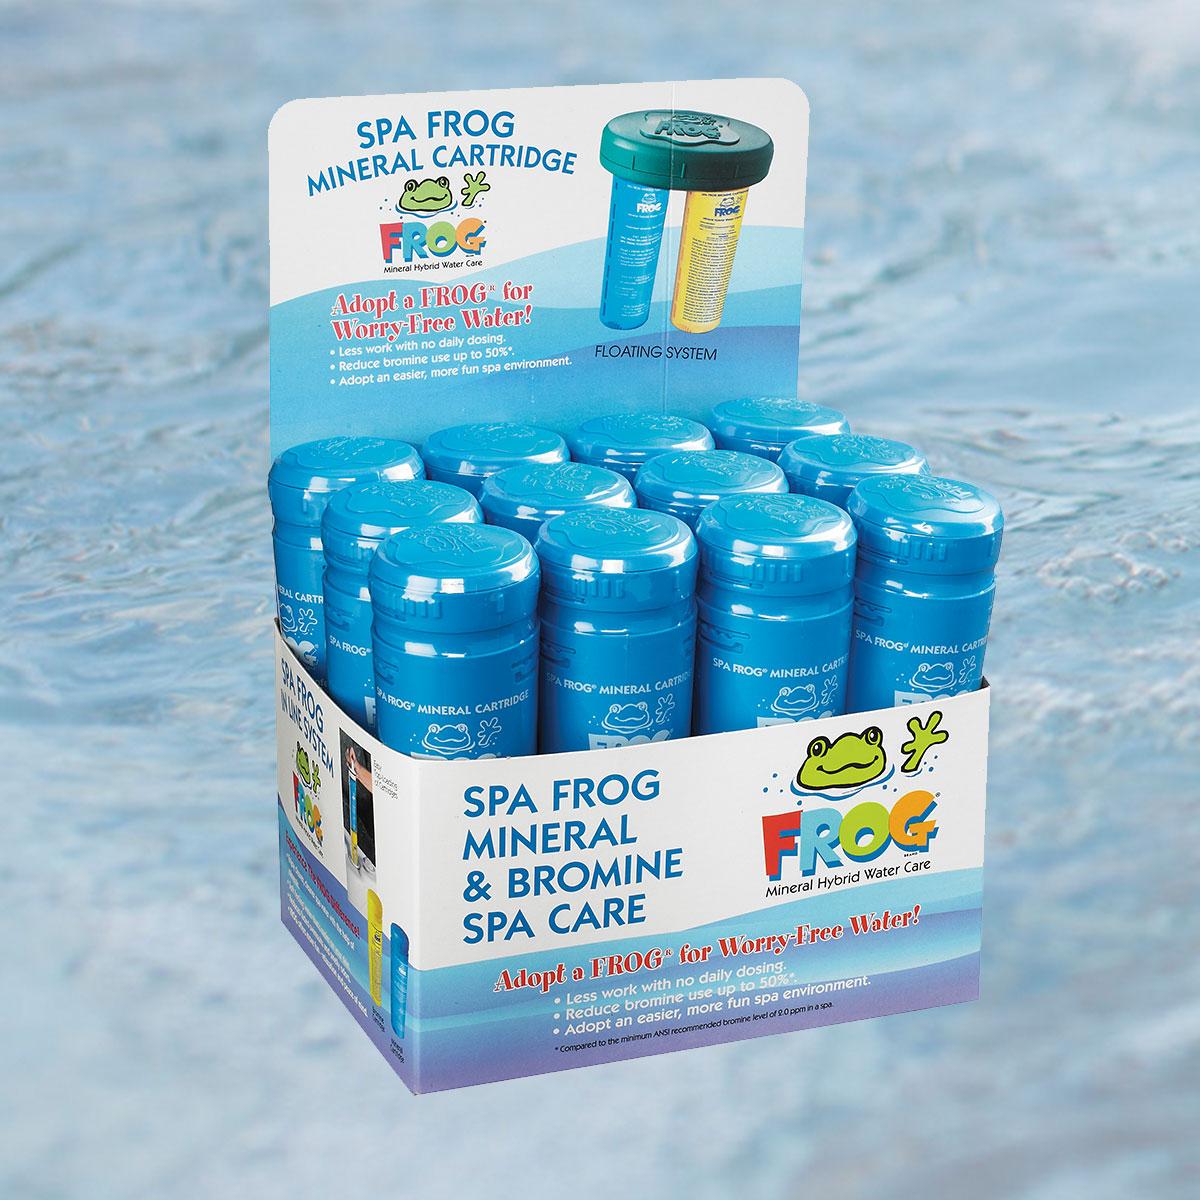 Spa Frog 174 Water Care System Hot Spring Spas Of La Crosse